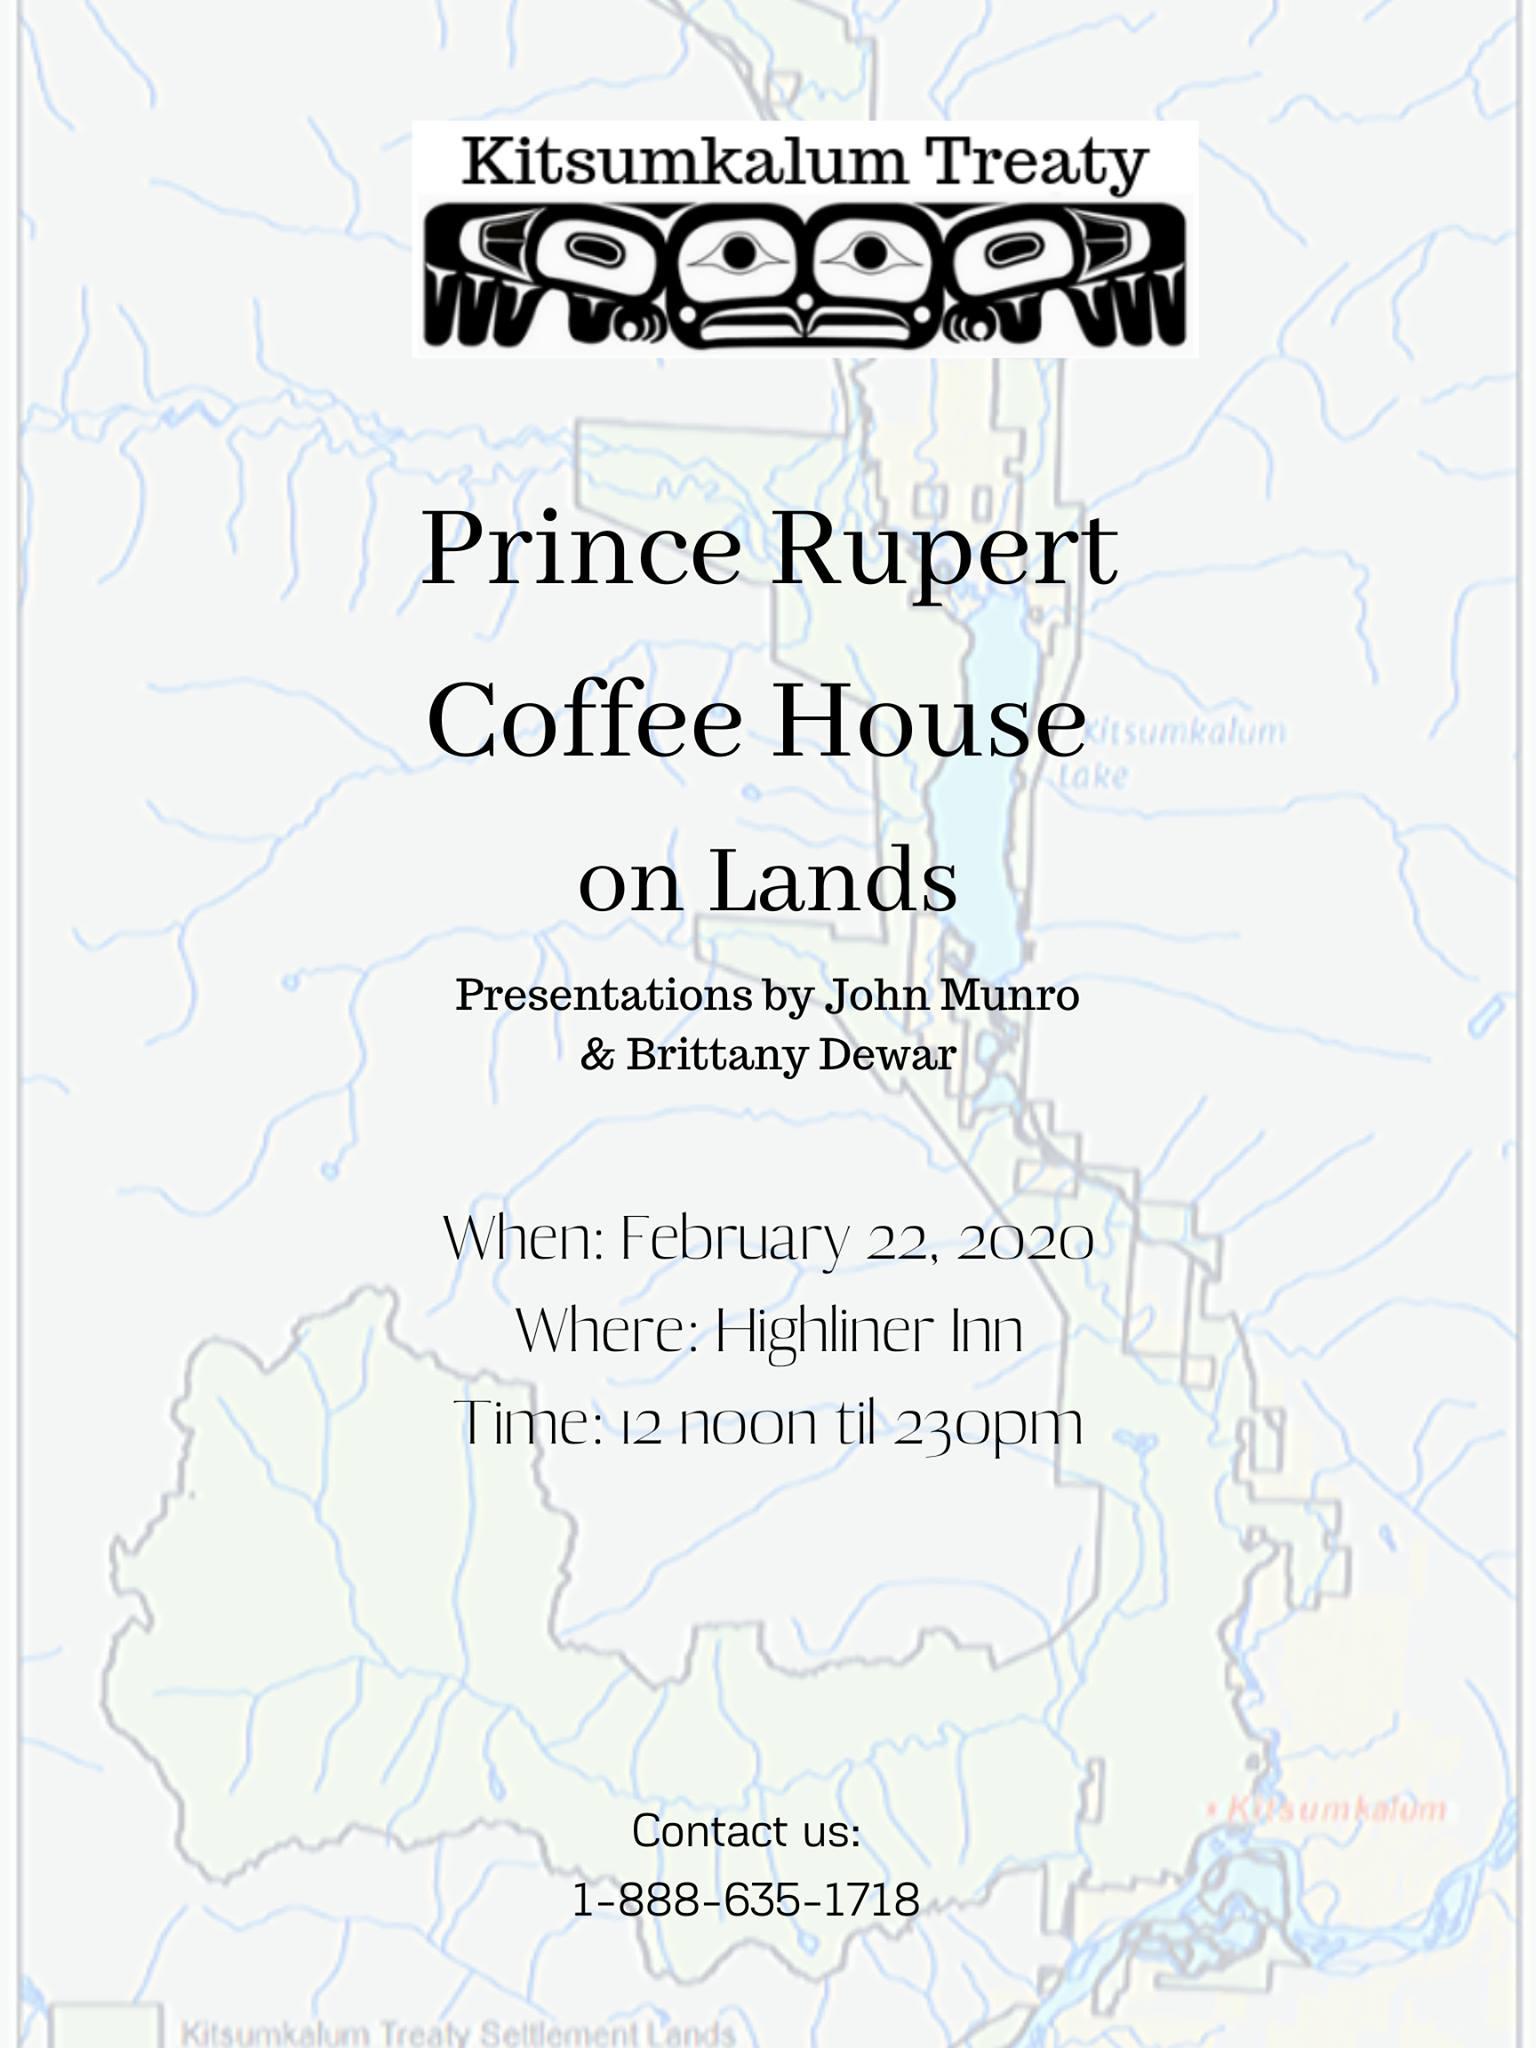 Prince Rupert Coffee House on Lands FEB 22